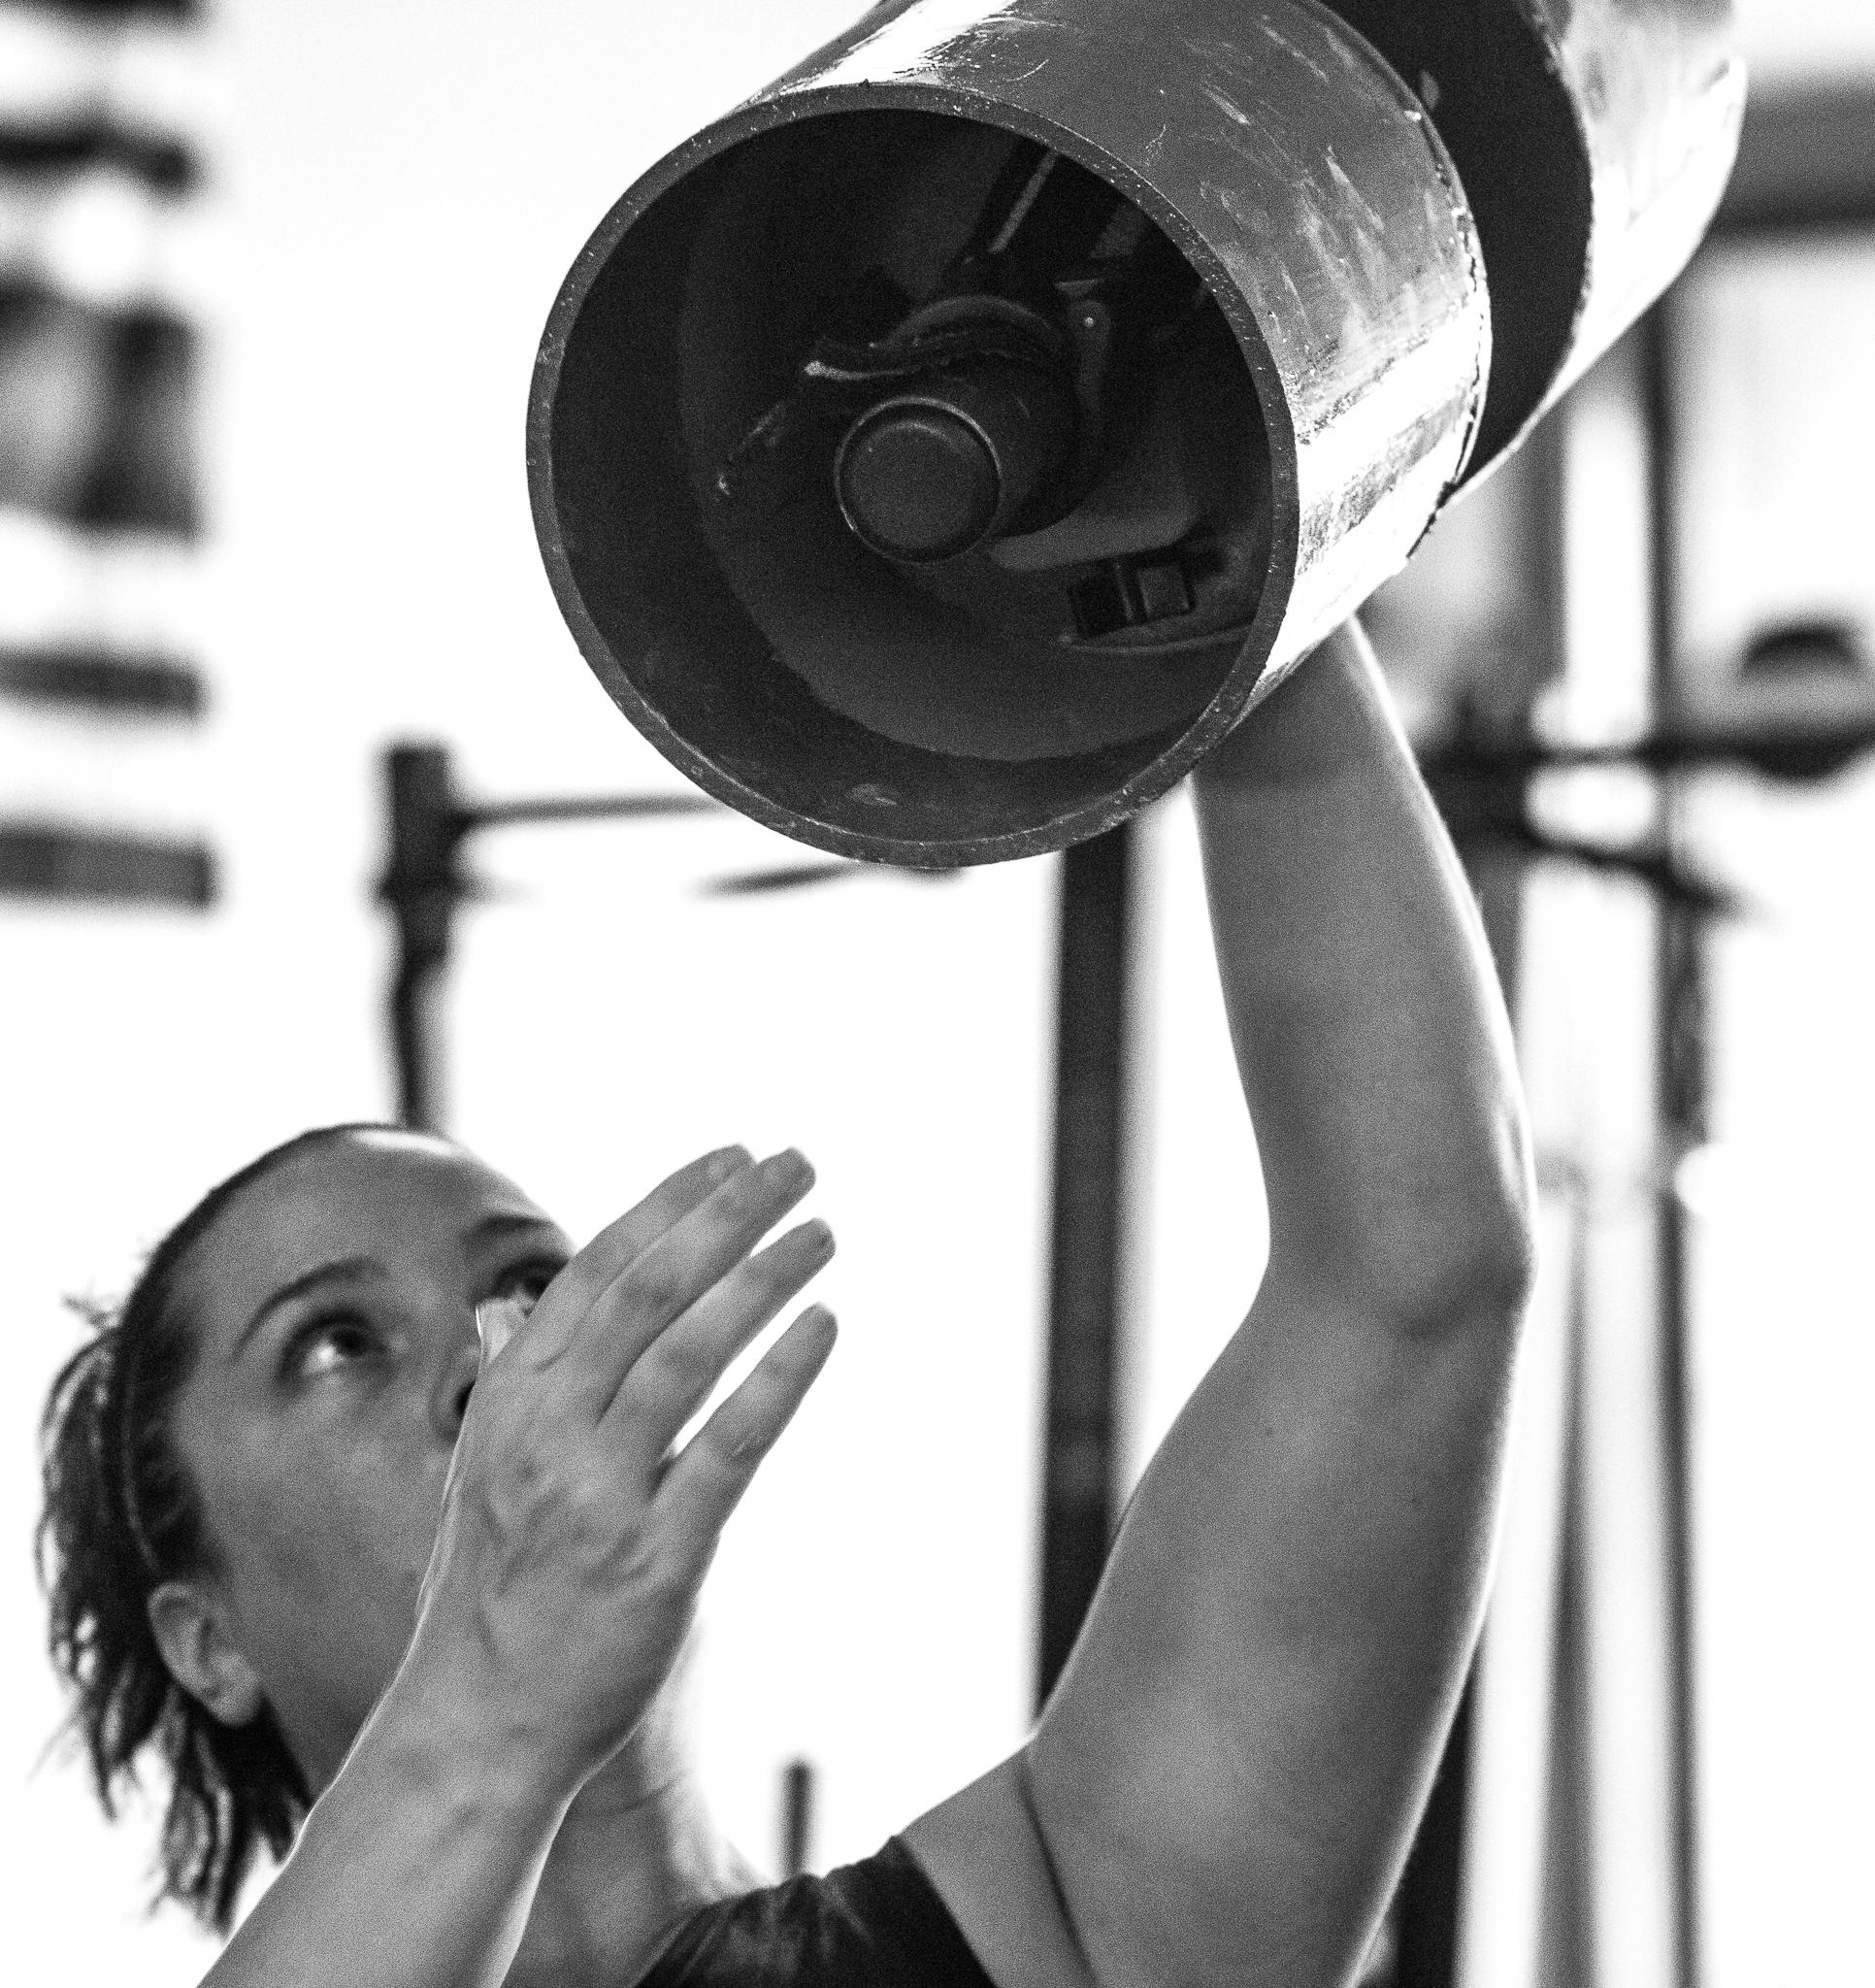 hurt-performance-4th-annual-little-viking-charity-washingtonville-new-york-strongman-eveyrdaylifters-vp (213 of 348).jpg